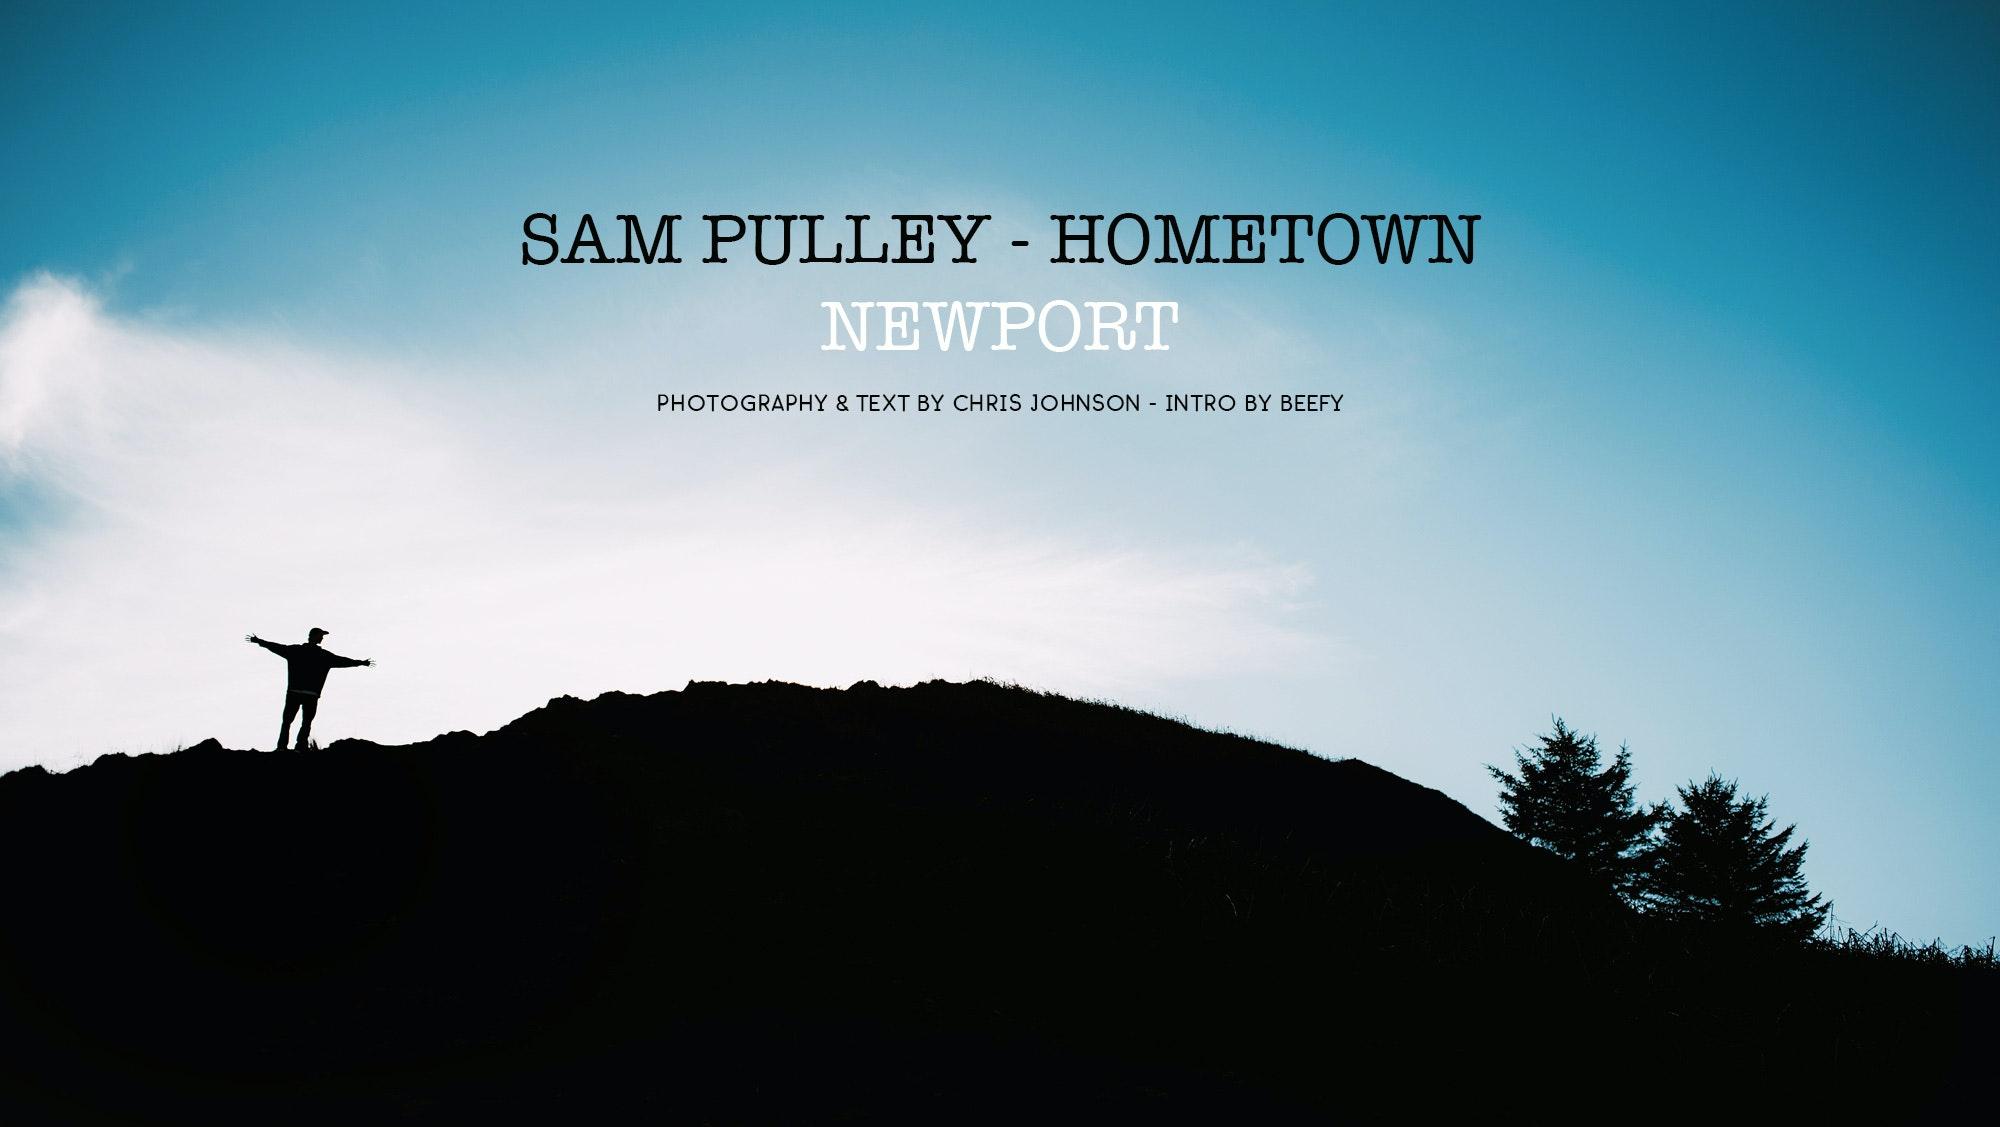 Sam Pulley – Hometown